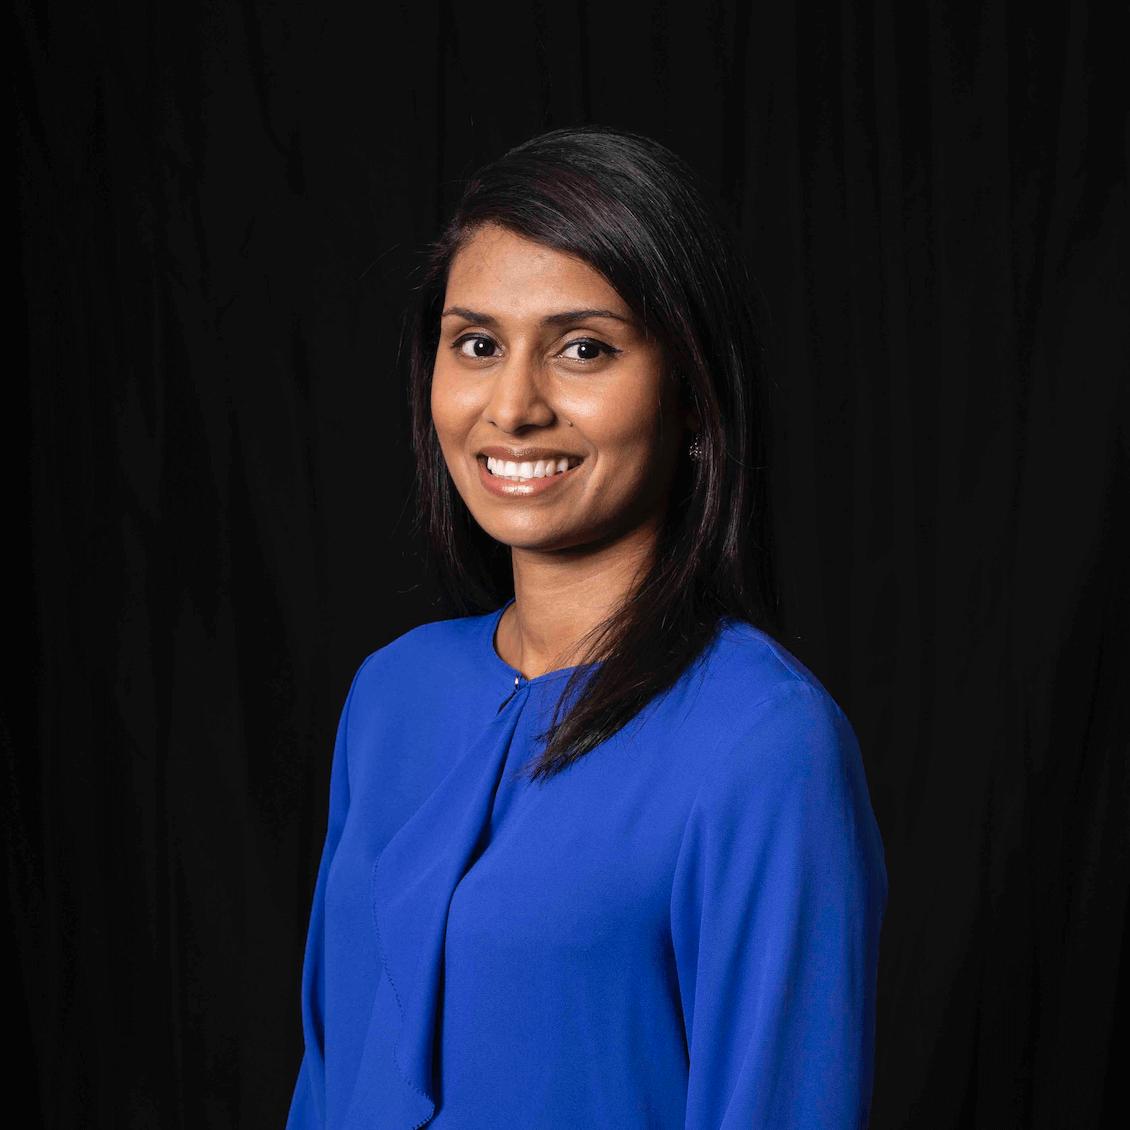 Azraa Meyer MBA mbagradschools ambassador